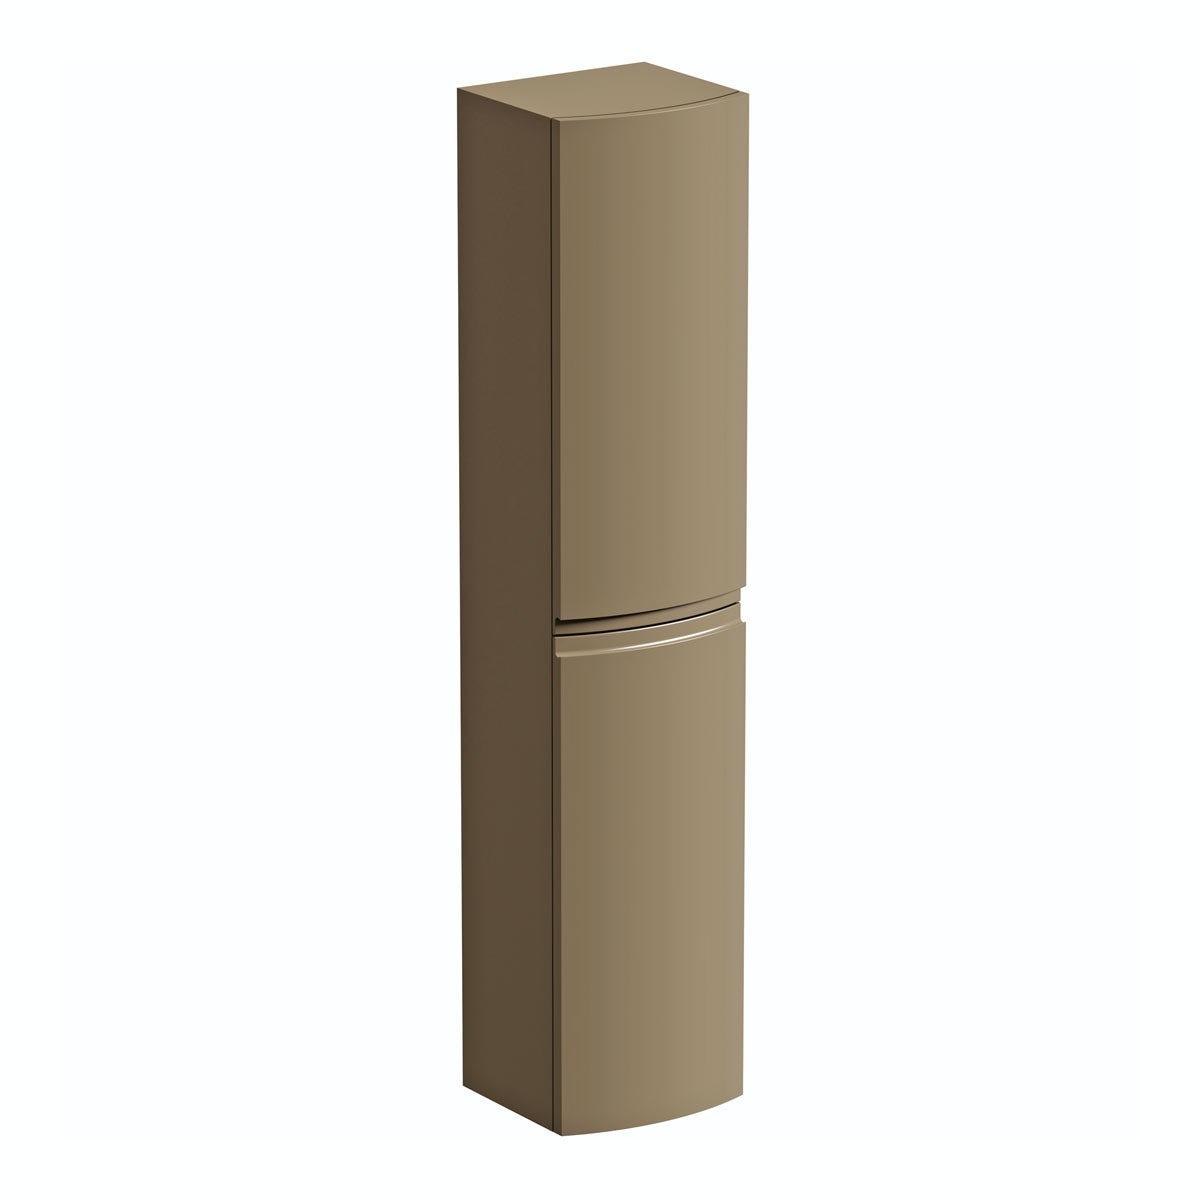 Mode Harrison mocha wall hung storage cabinet